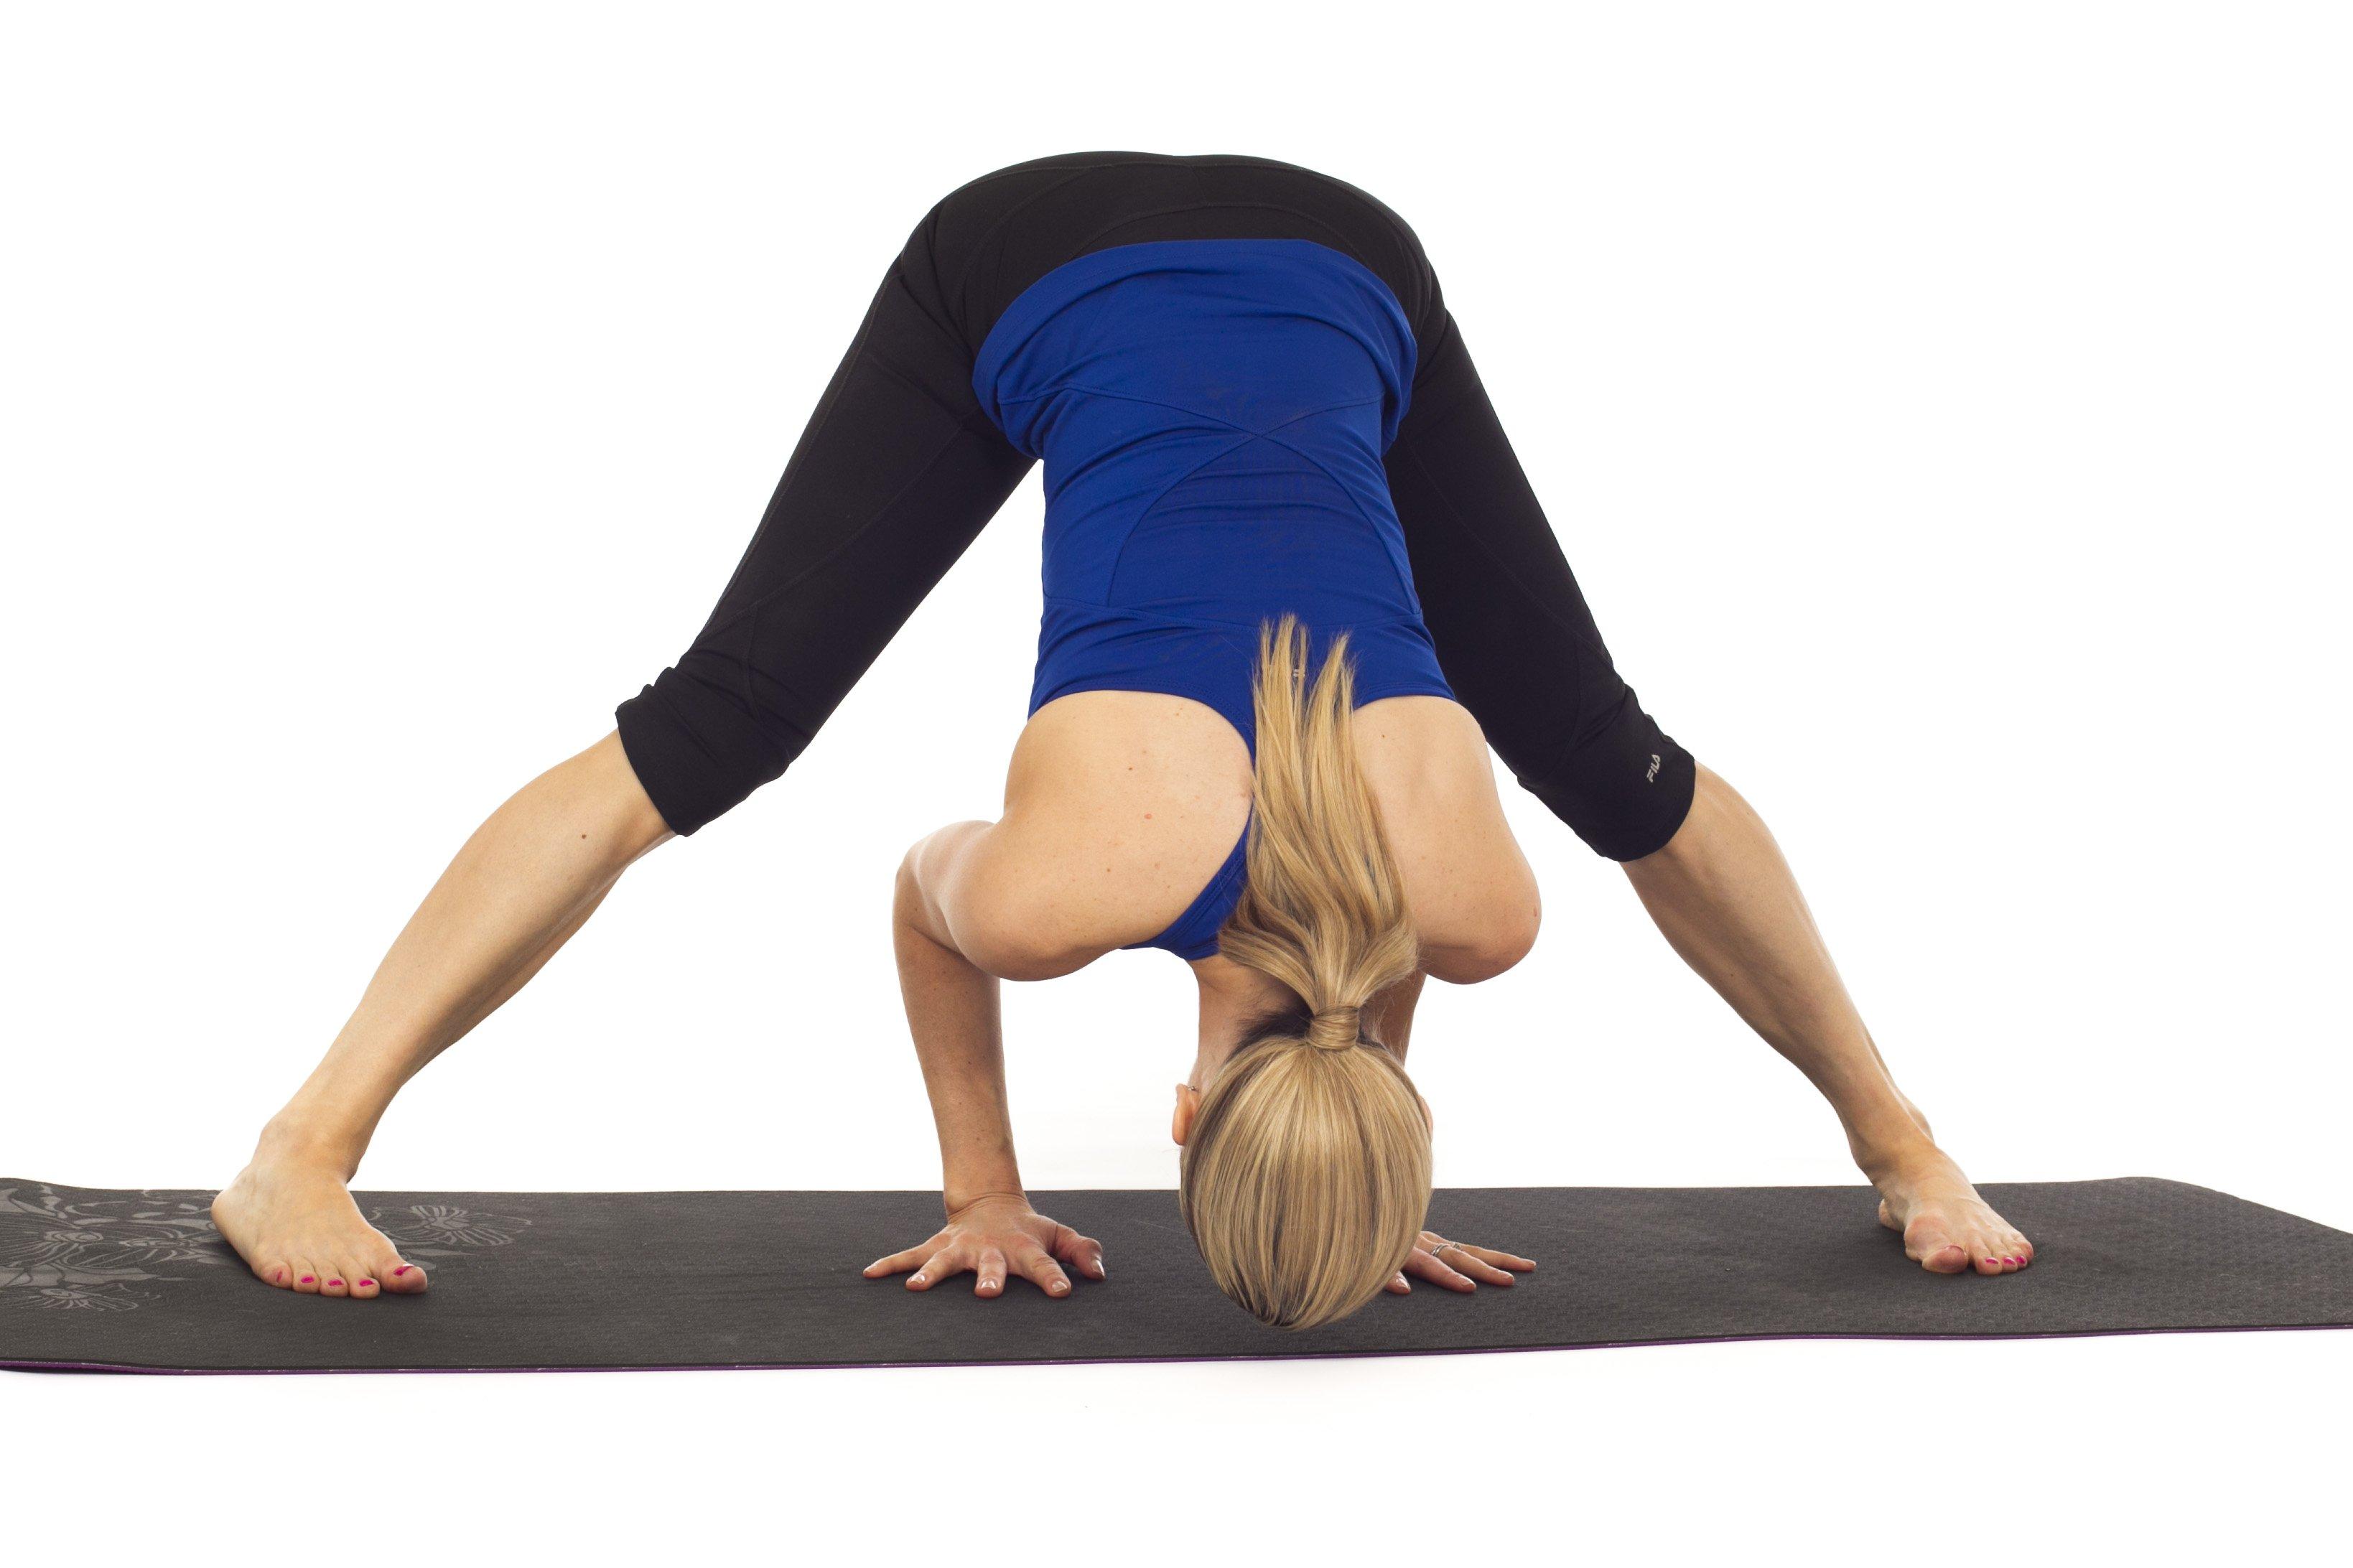 Straddle Position